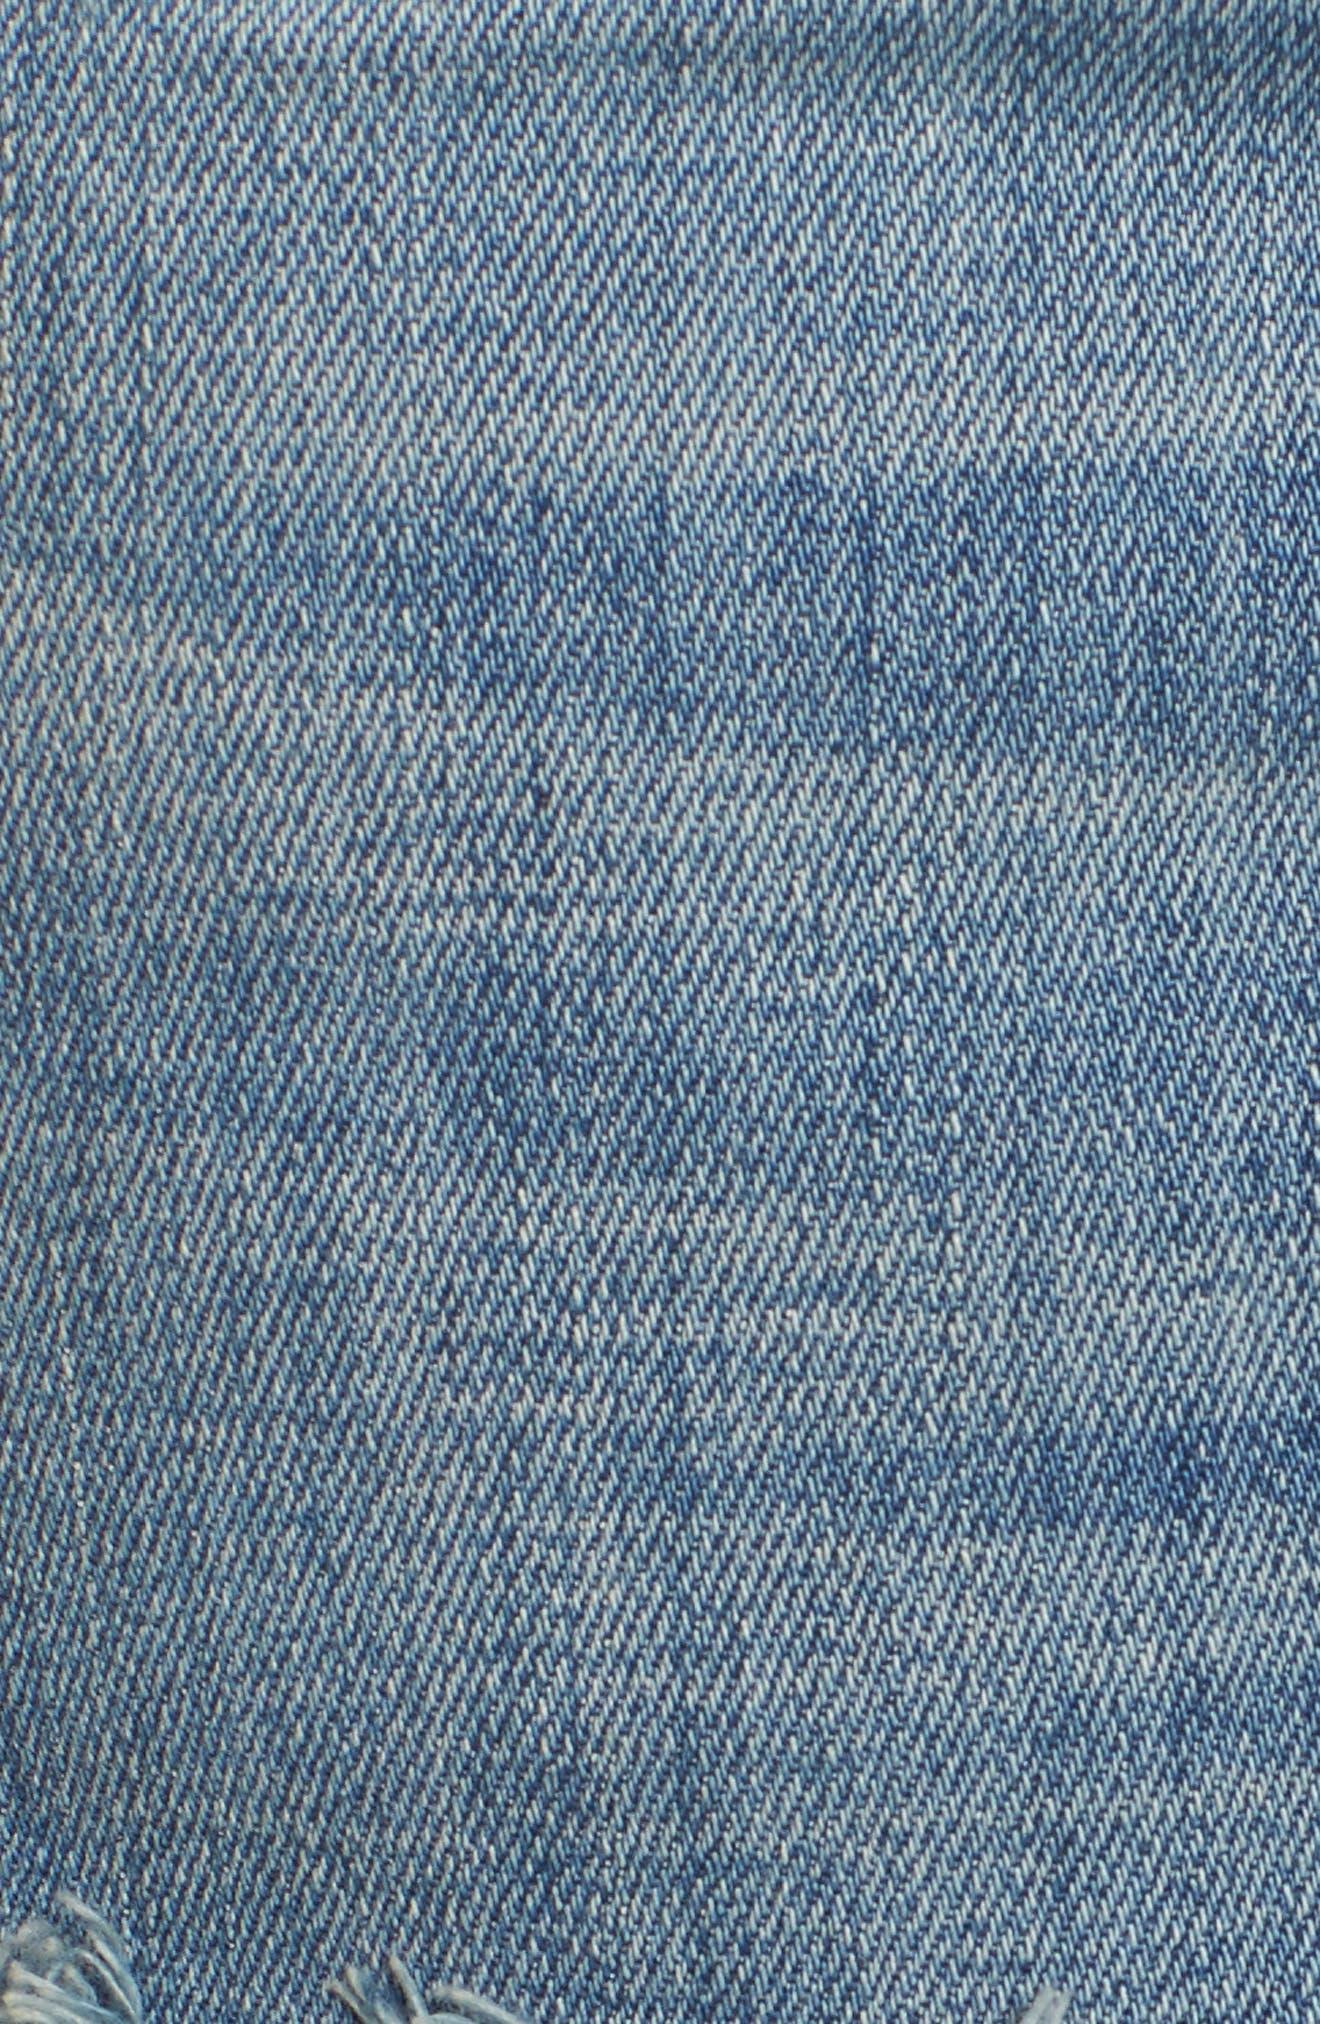 Halle Super Skinny Jeans,                             Alternate thumbnail 6, color,                             401